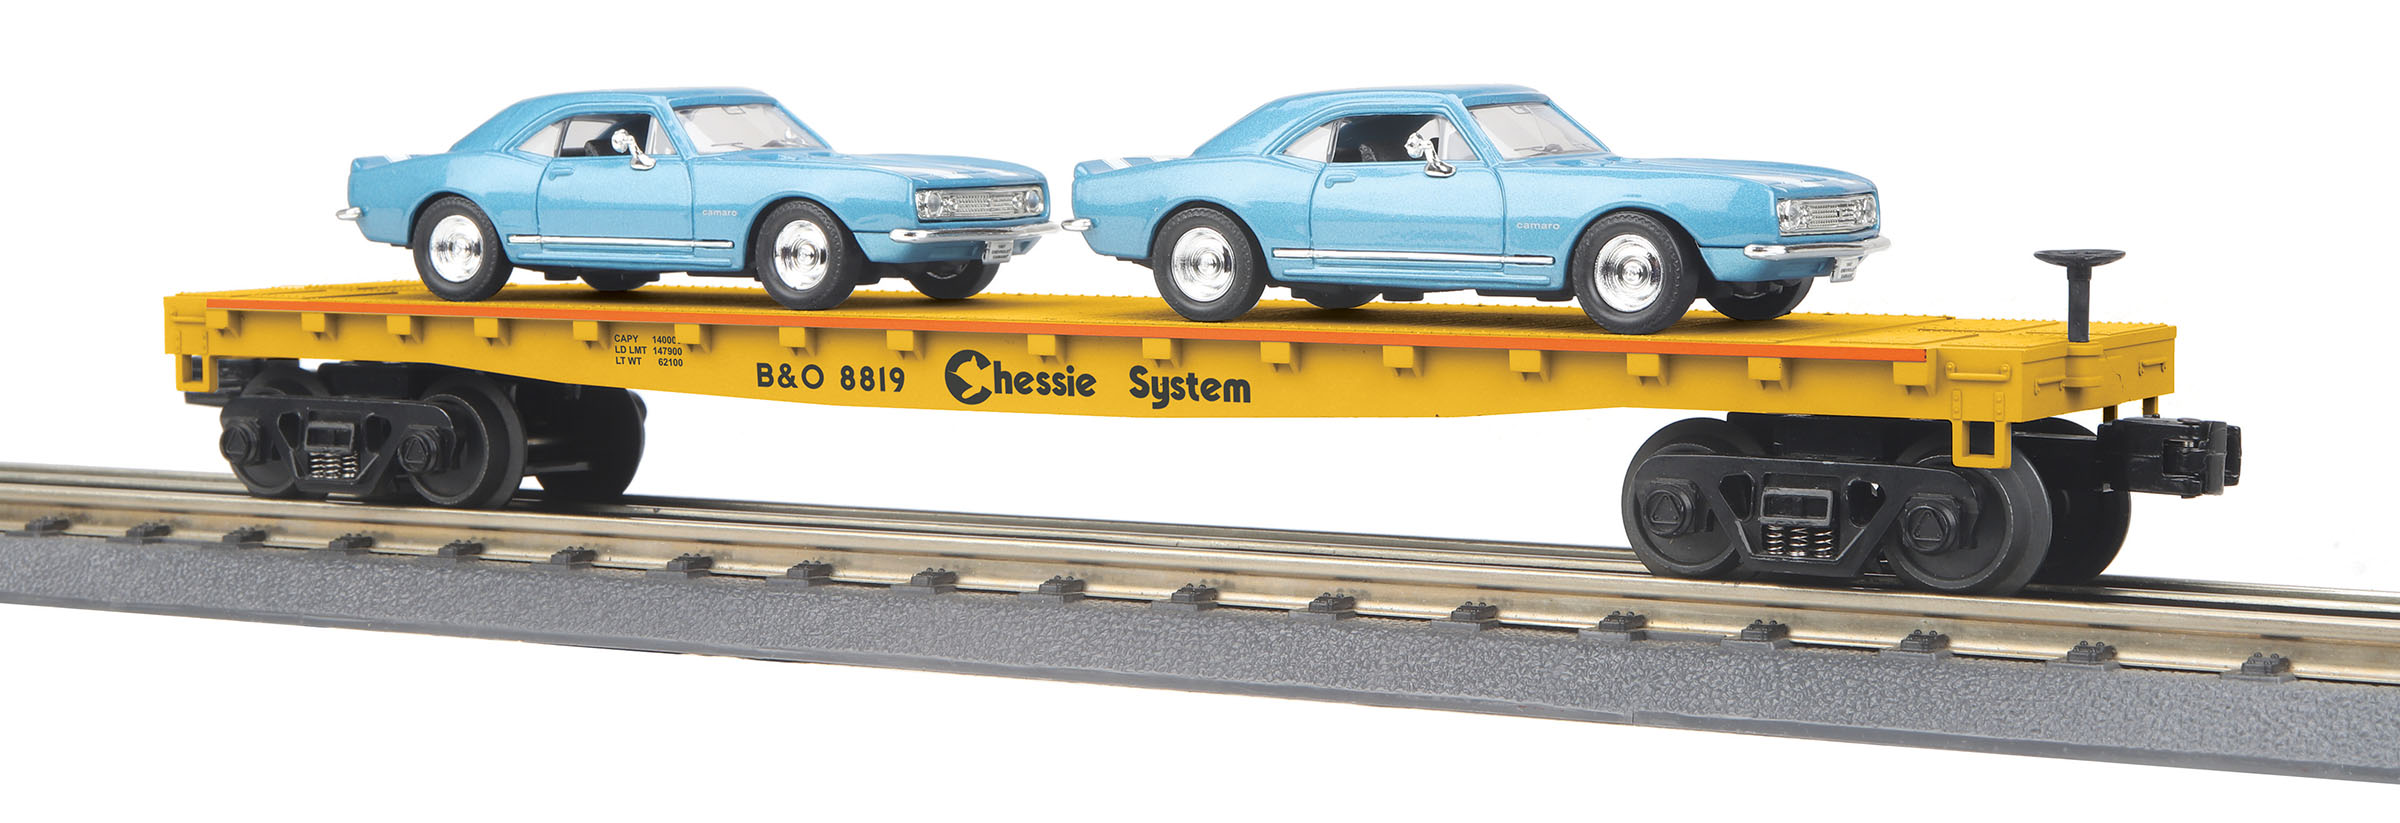 MTH 30-76792 Flatcar with 2 '67 Chevy Camaros 3 Rail RailKing Chessie System 8819